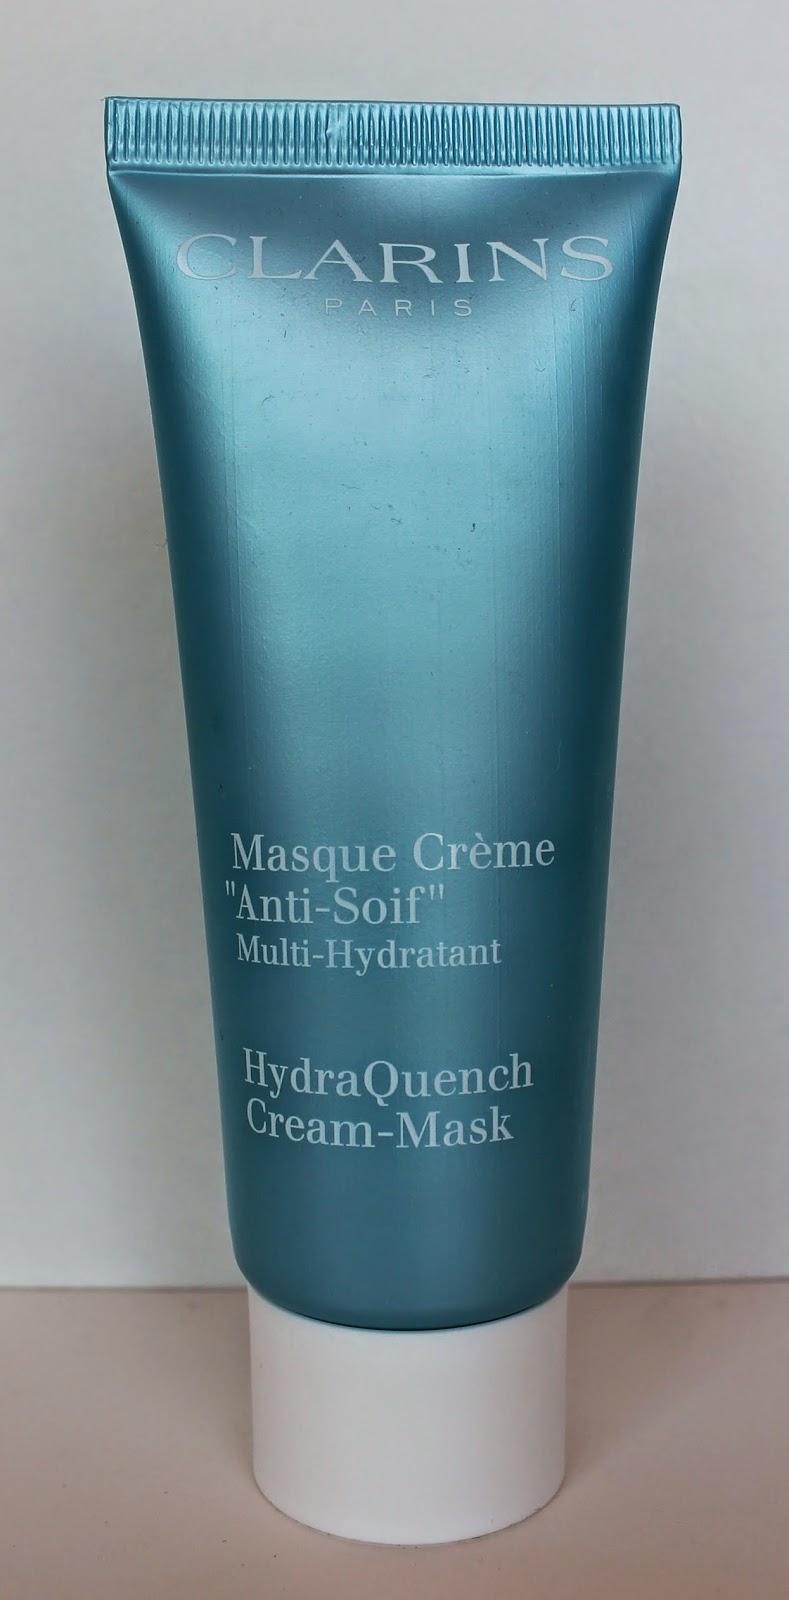 Clarins Masque Crème Anti-Soif